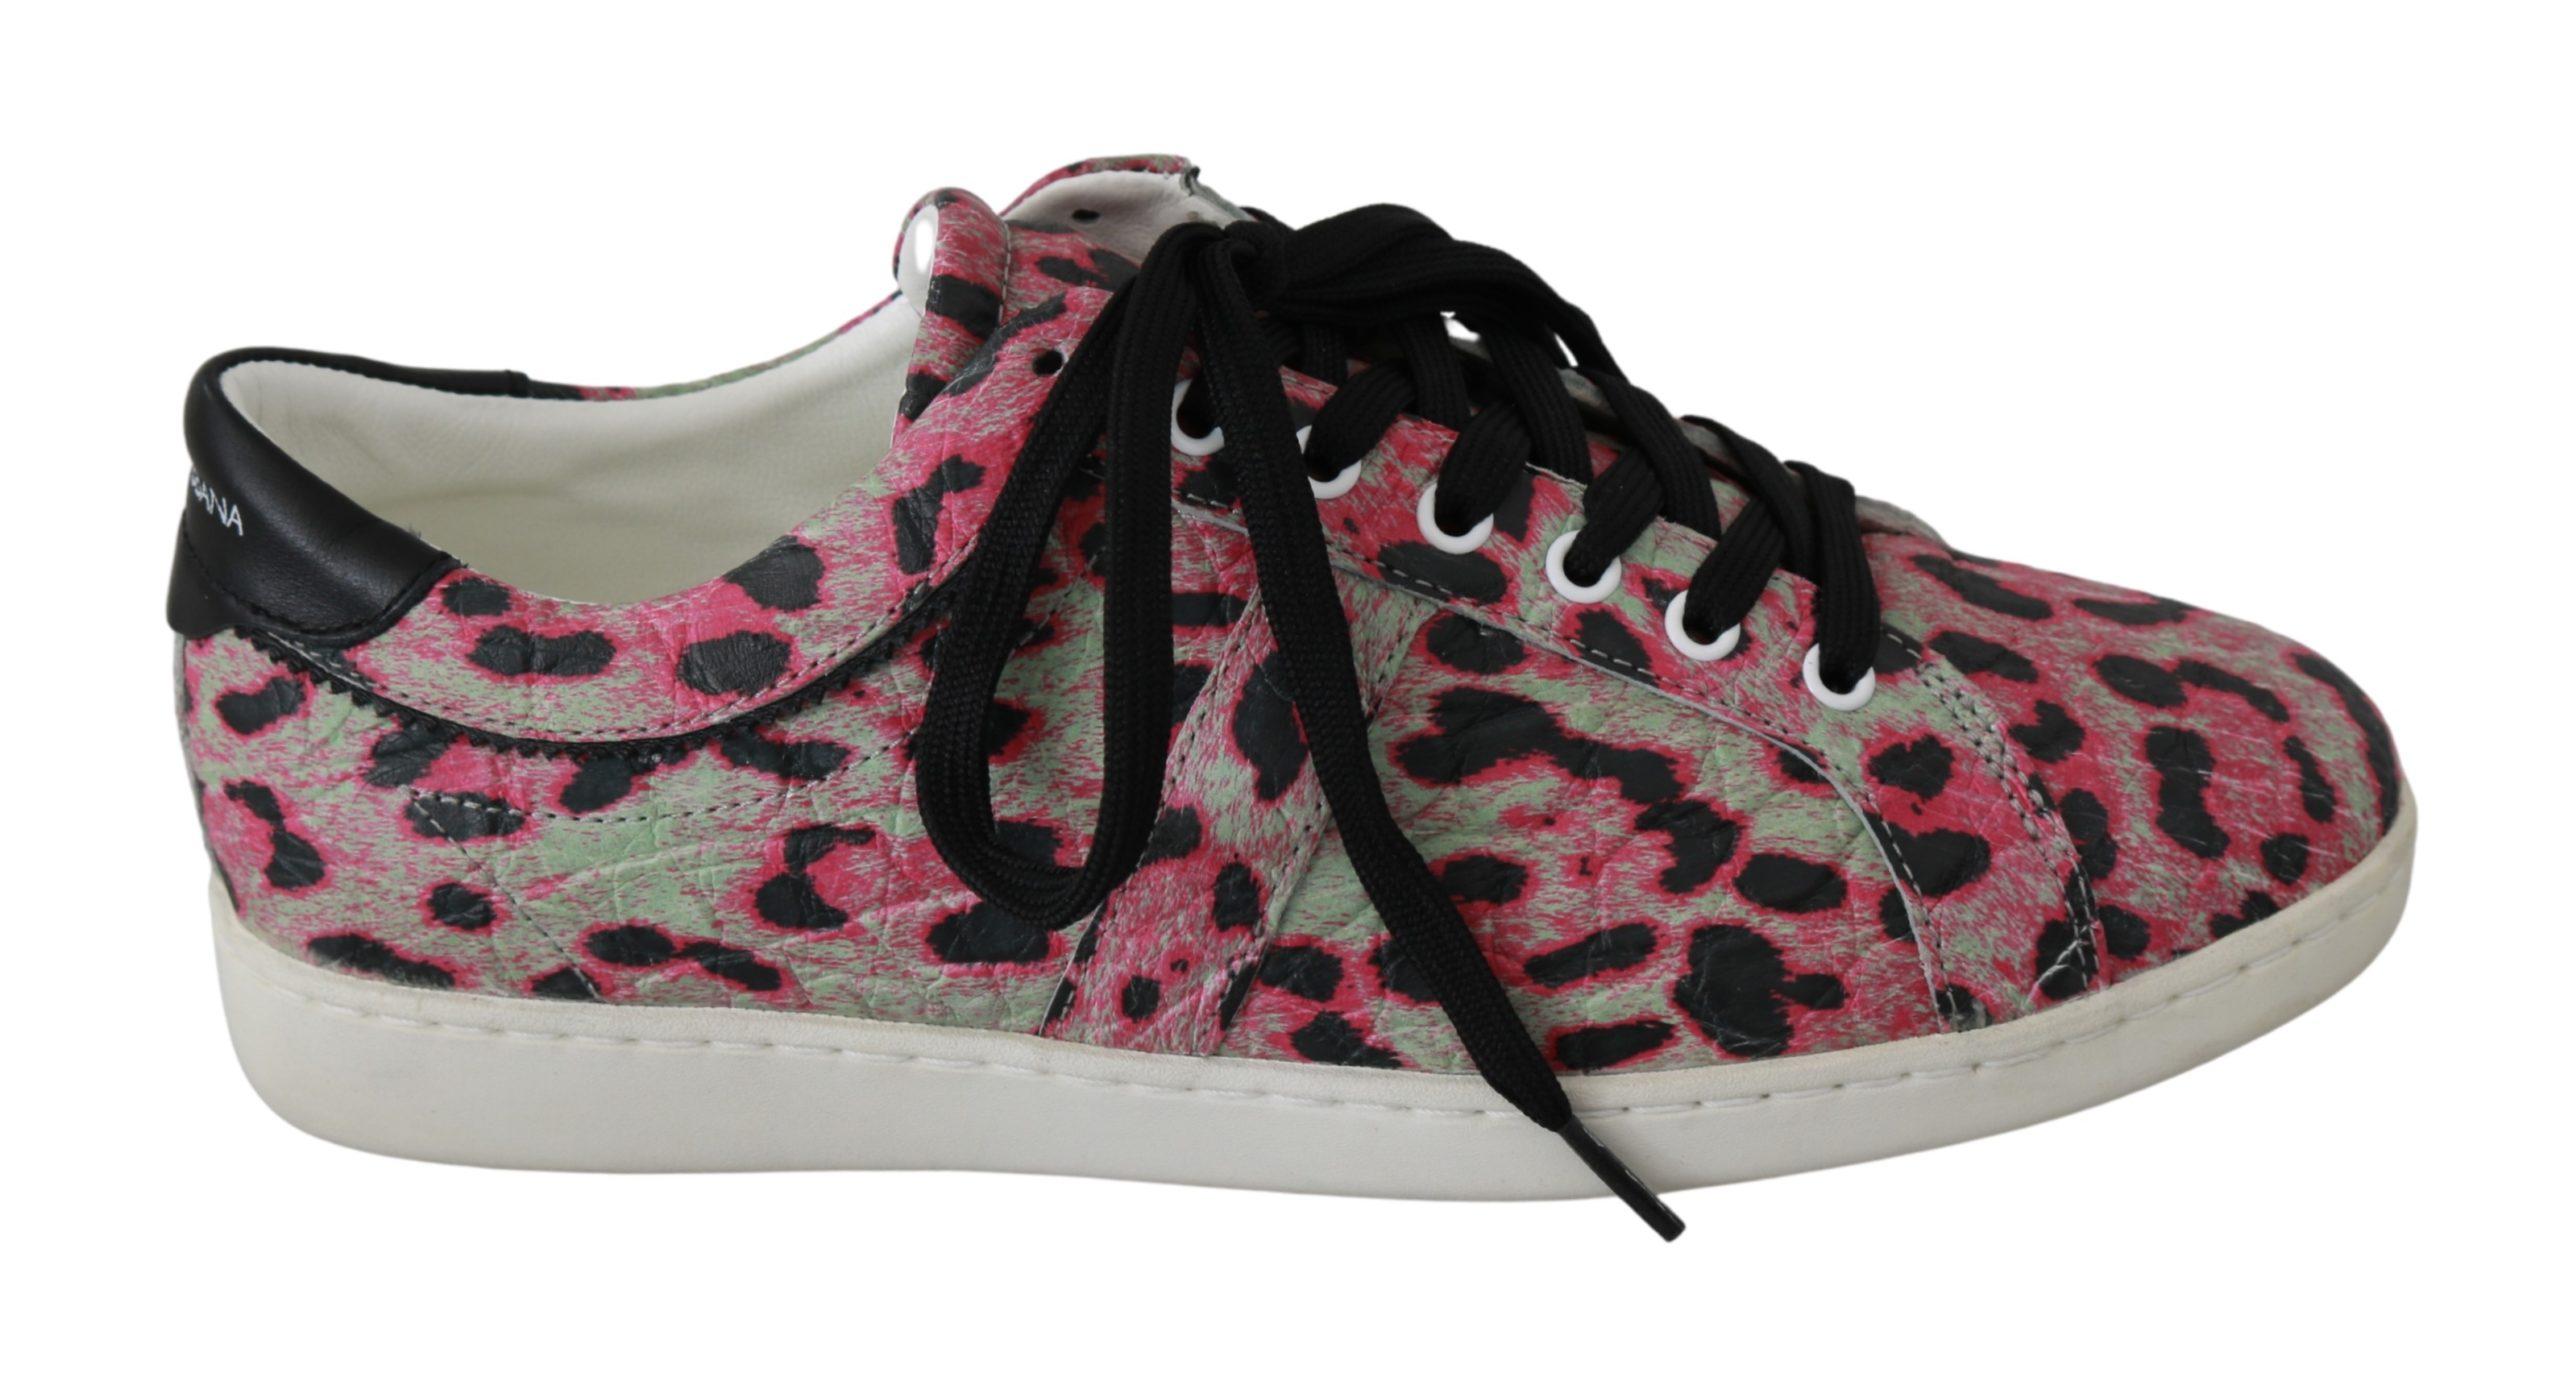 Dolce & Gabbana Women's Leopard Print Leather Trainer Multicolor MV2683 - EU42/US9